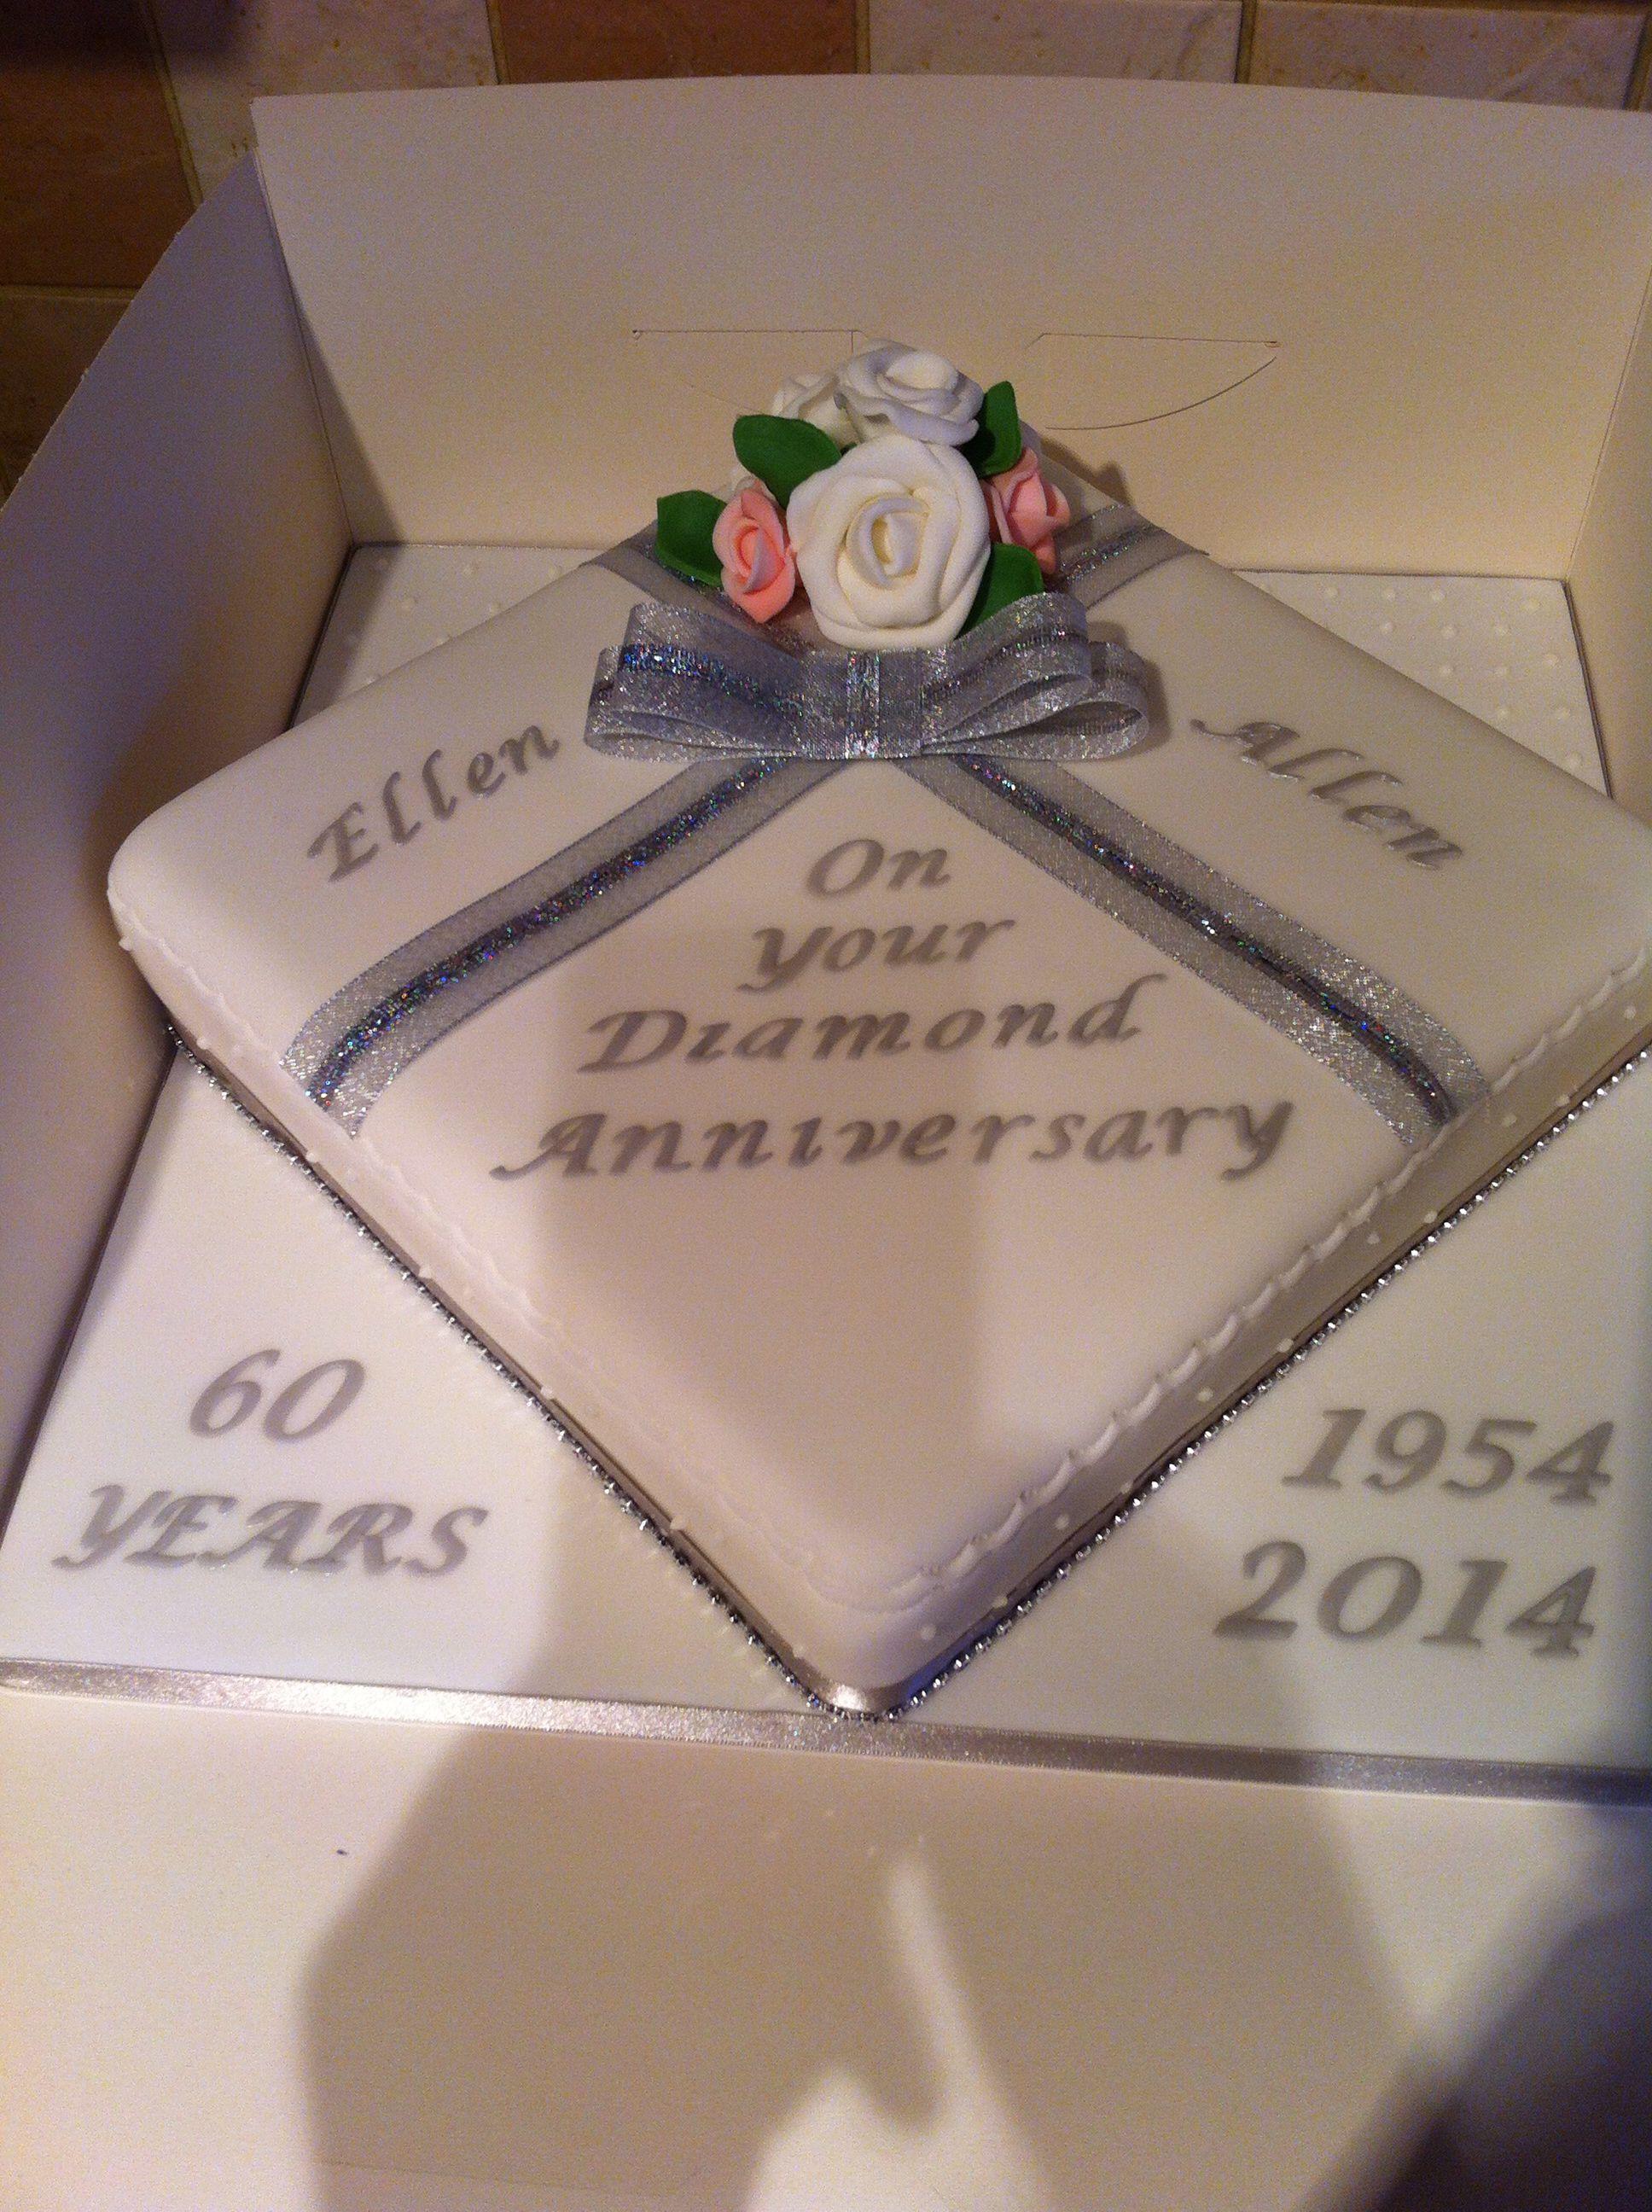 Diamond wedding anniversary cake … Diamond anniversary